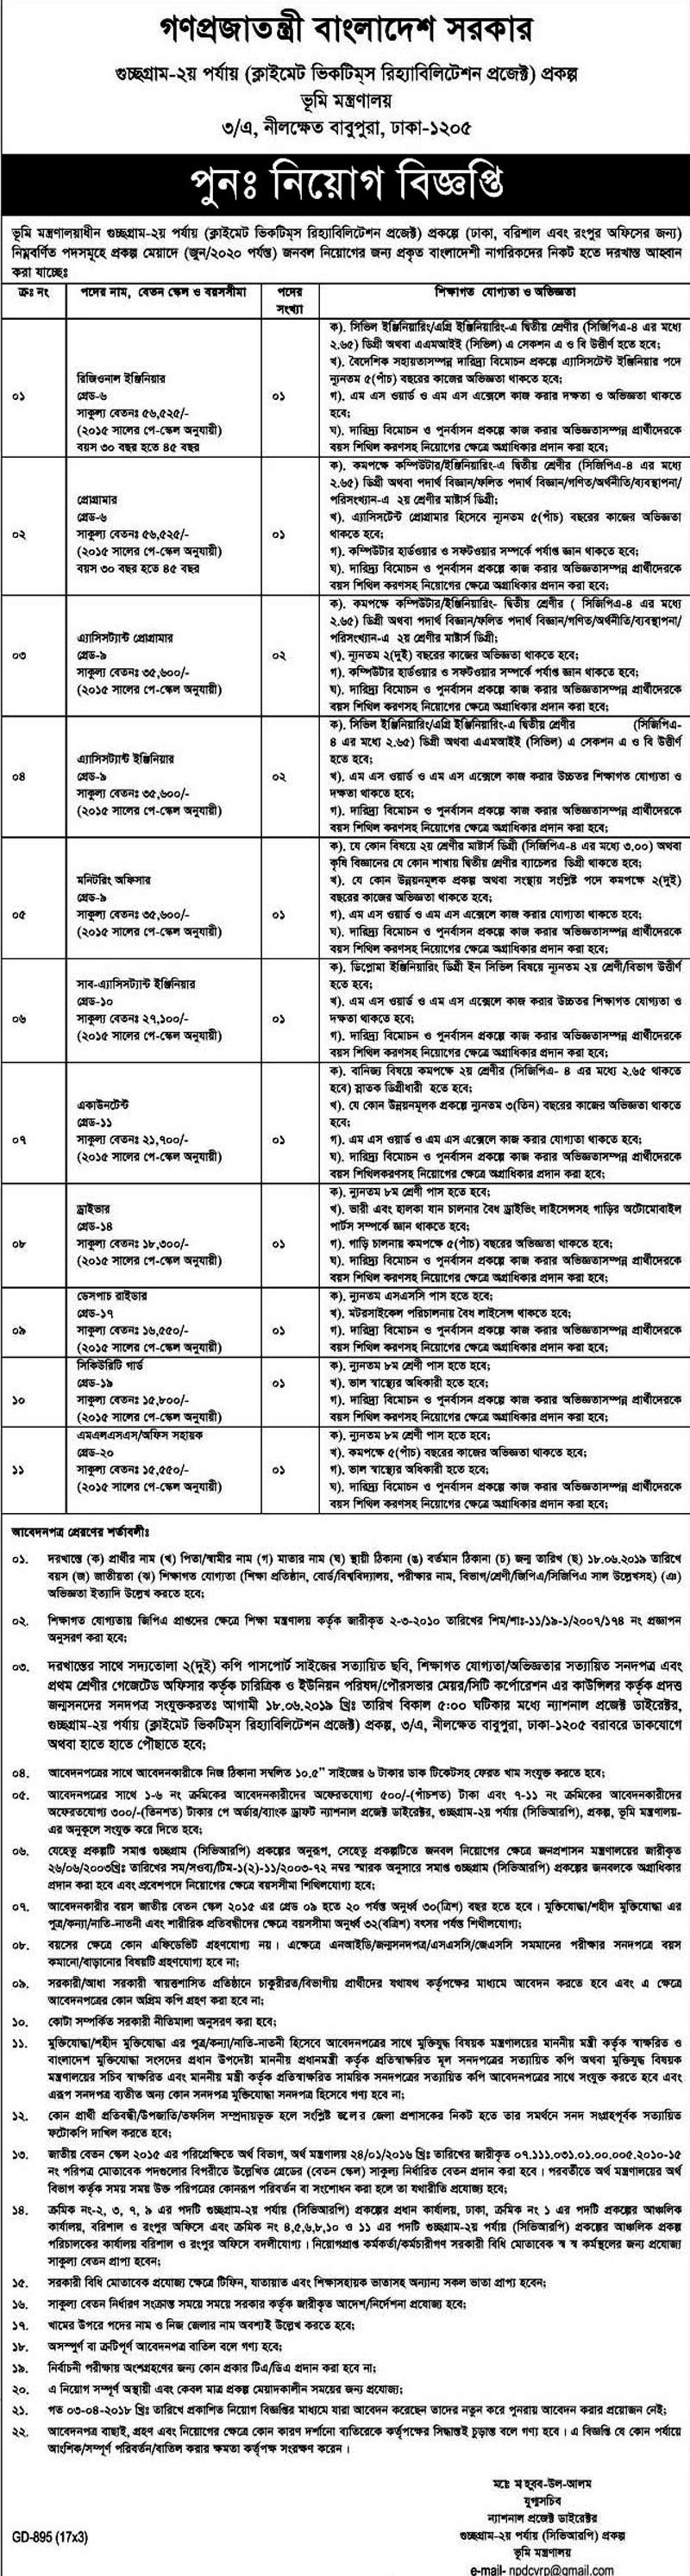 Land Ministry Job Circular 2019